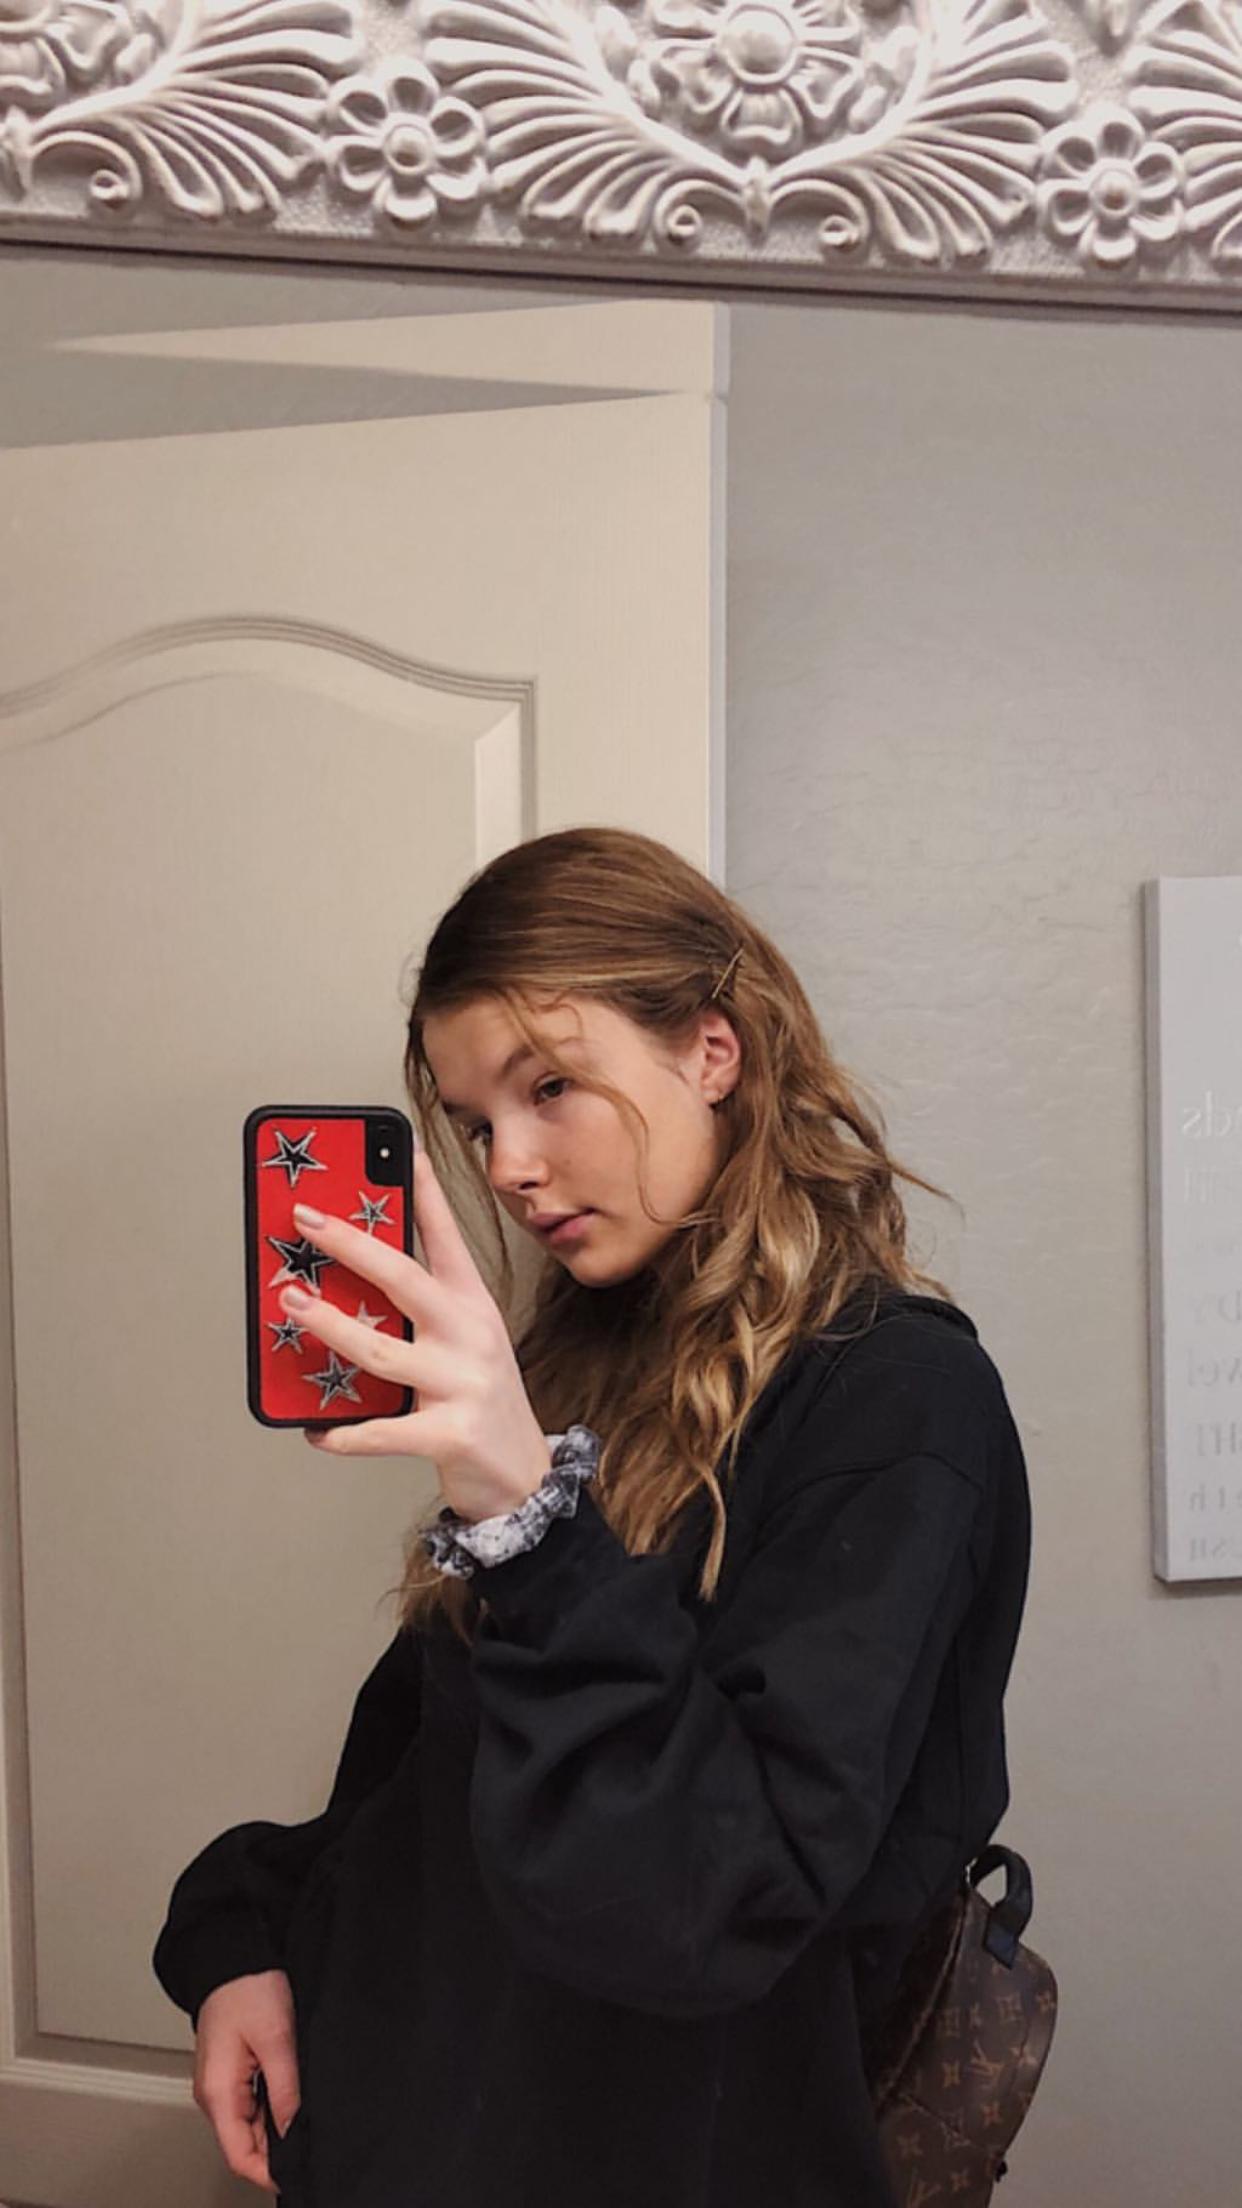 Pin By Teelee Yeezee On Ellie Thumann Makeup Inspo Ideas